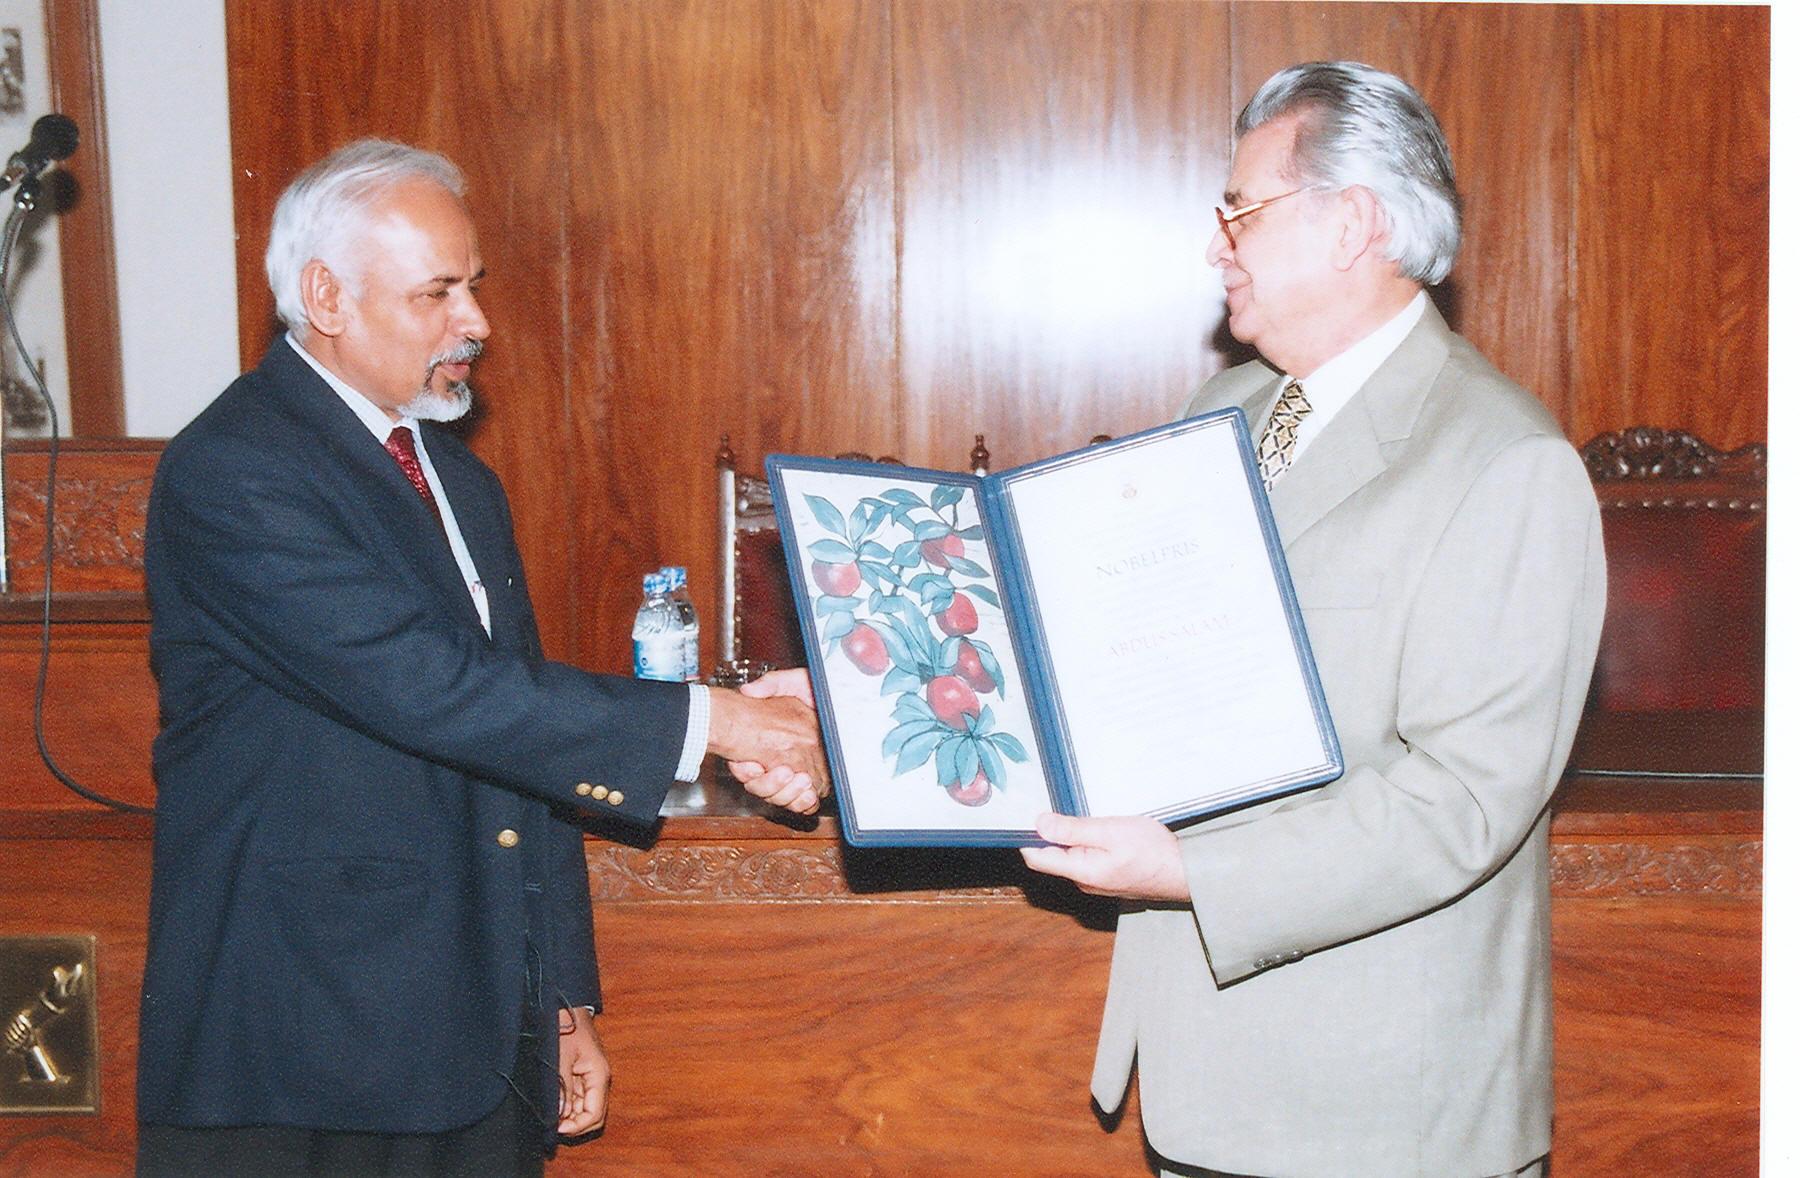 K.R. Sreenivasan and Khalid Aftab